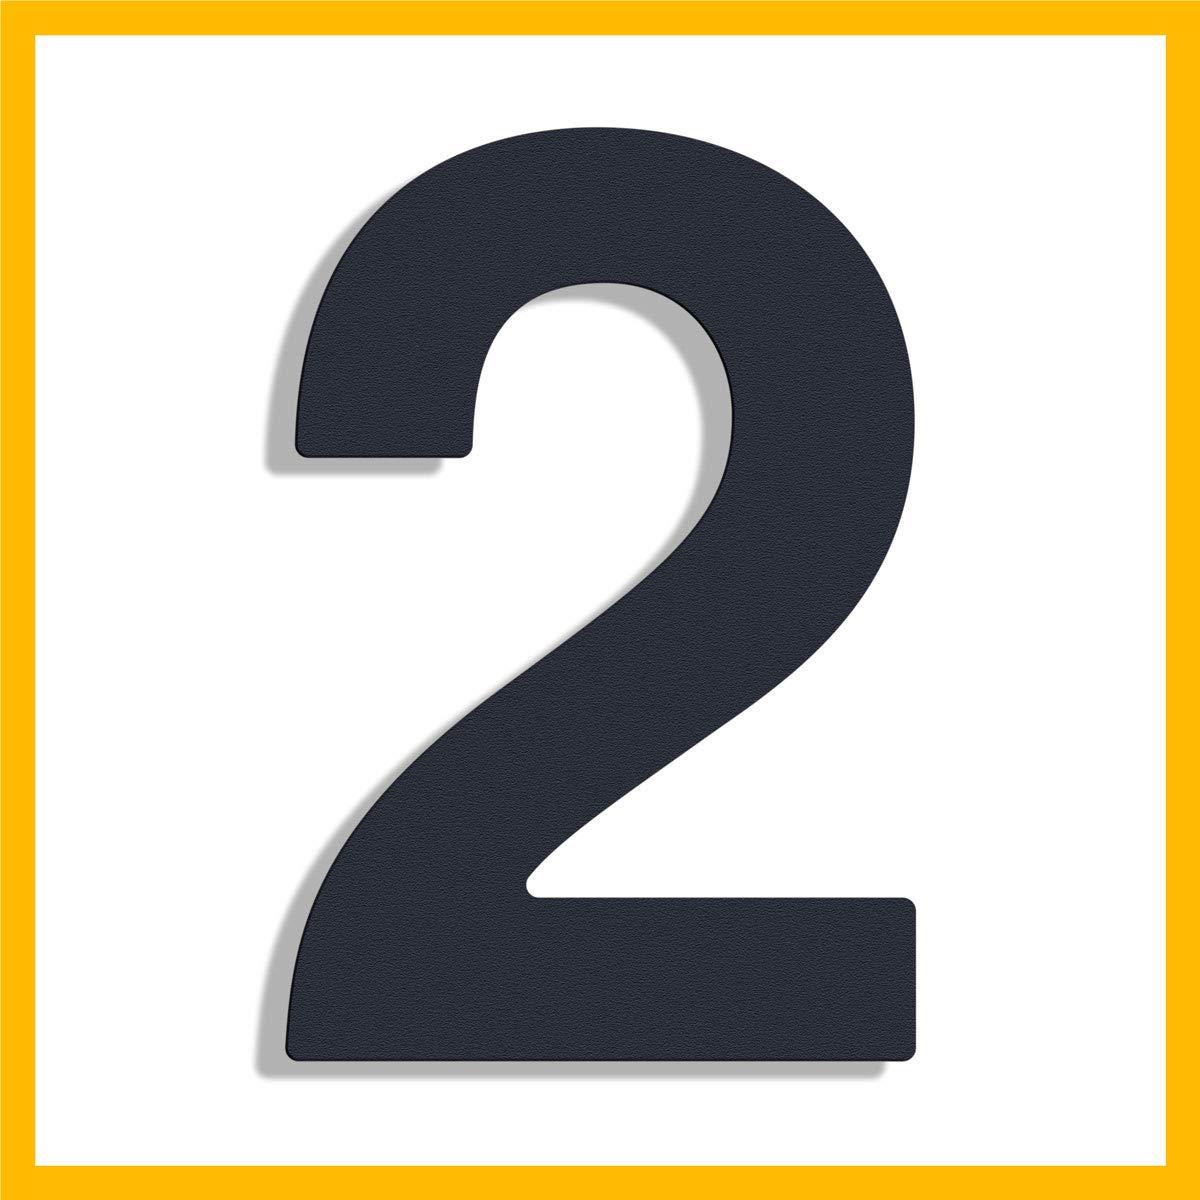 20cm Design Edelstahl Hausnummer, RAL 7016 anthrazit beschichtet, inkl. Montagematerial/H: 200mm (Ziffer'2') inkl. Montagematerial/H: 200mm (Ziffer2) Thorwa® Design